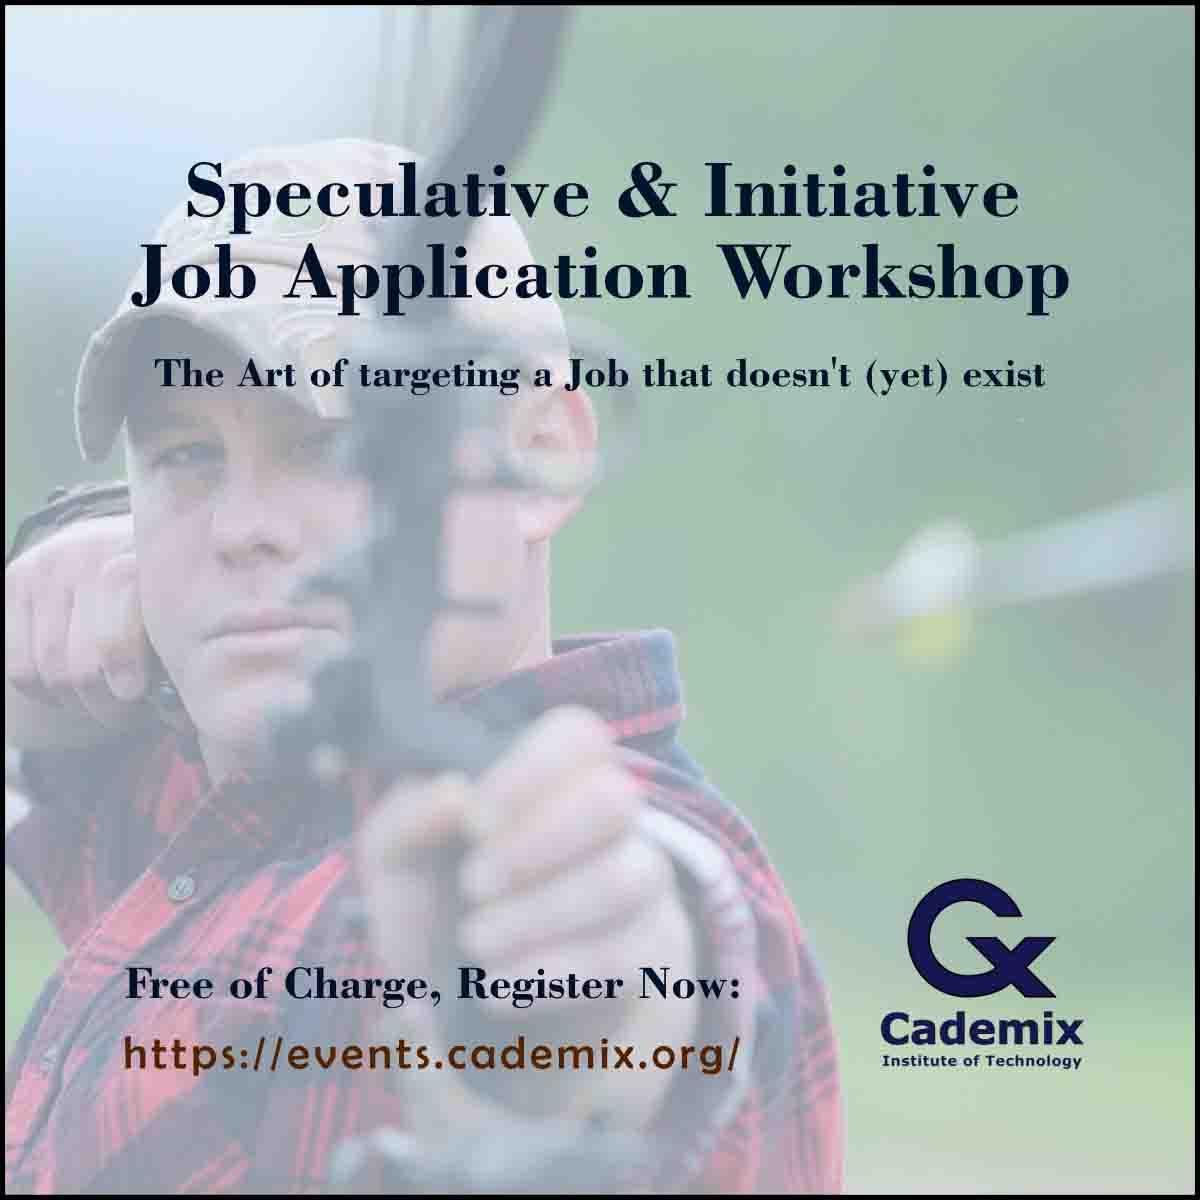 Speculative & Initiative Job Application Workshop